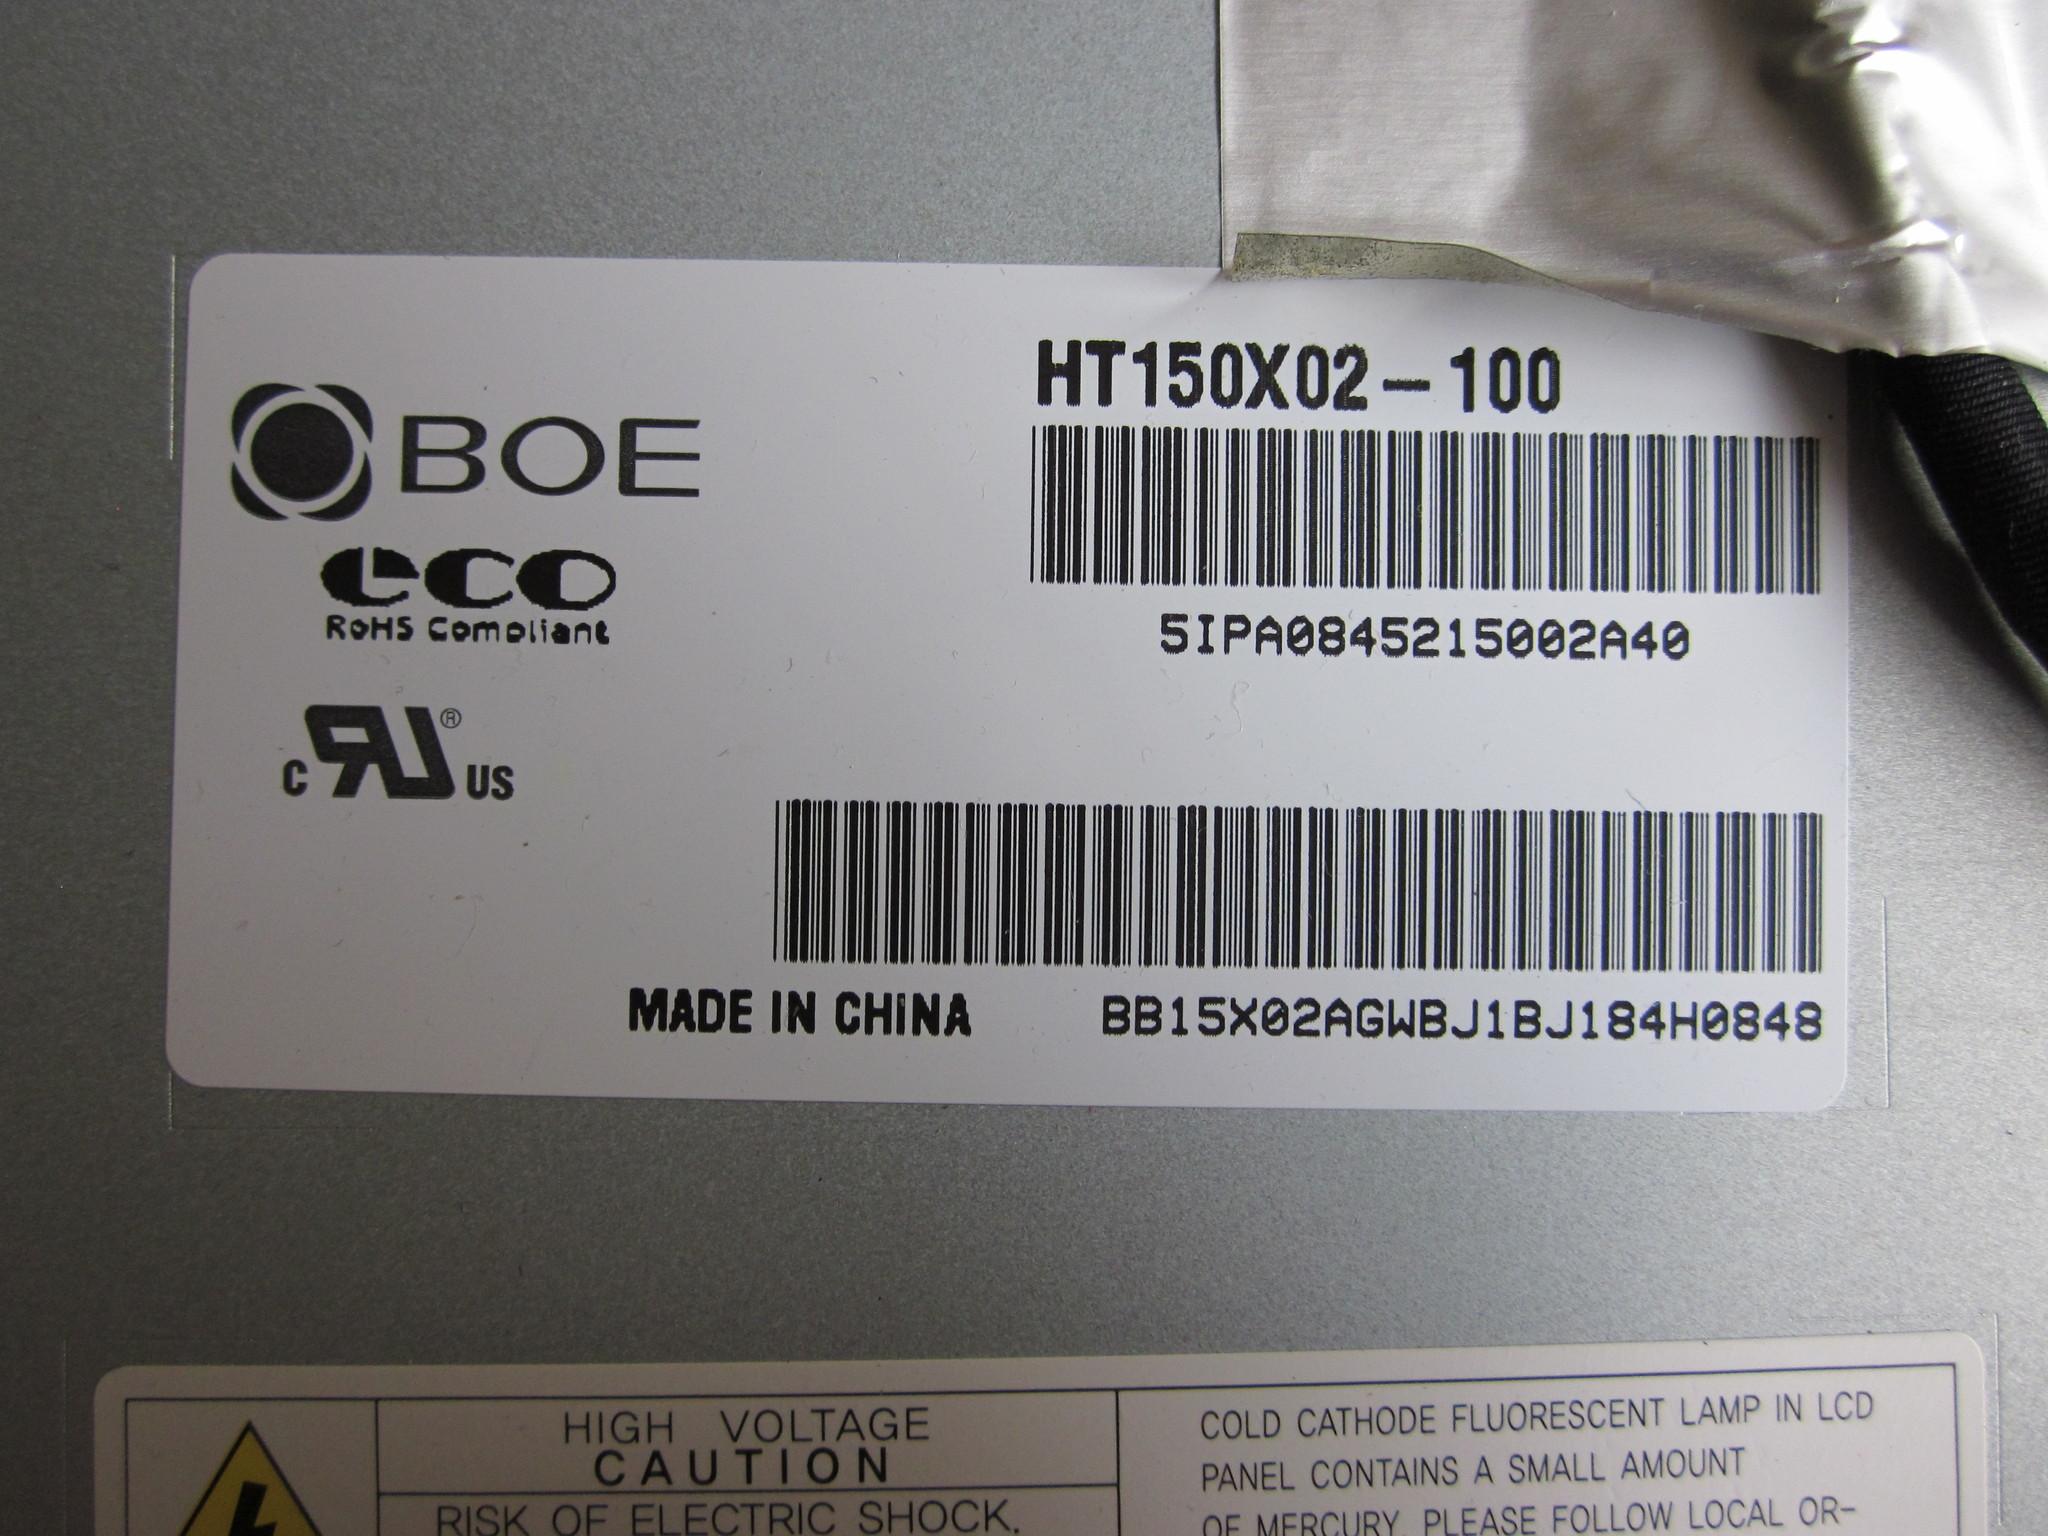 HT150X02-100